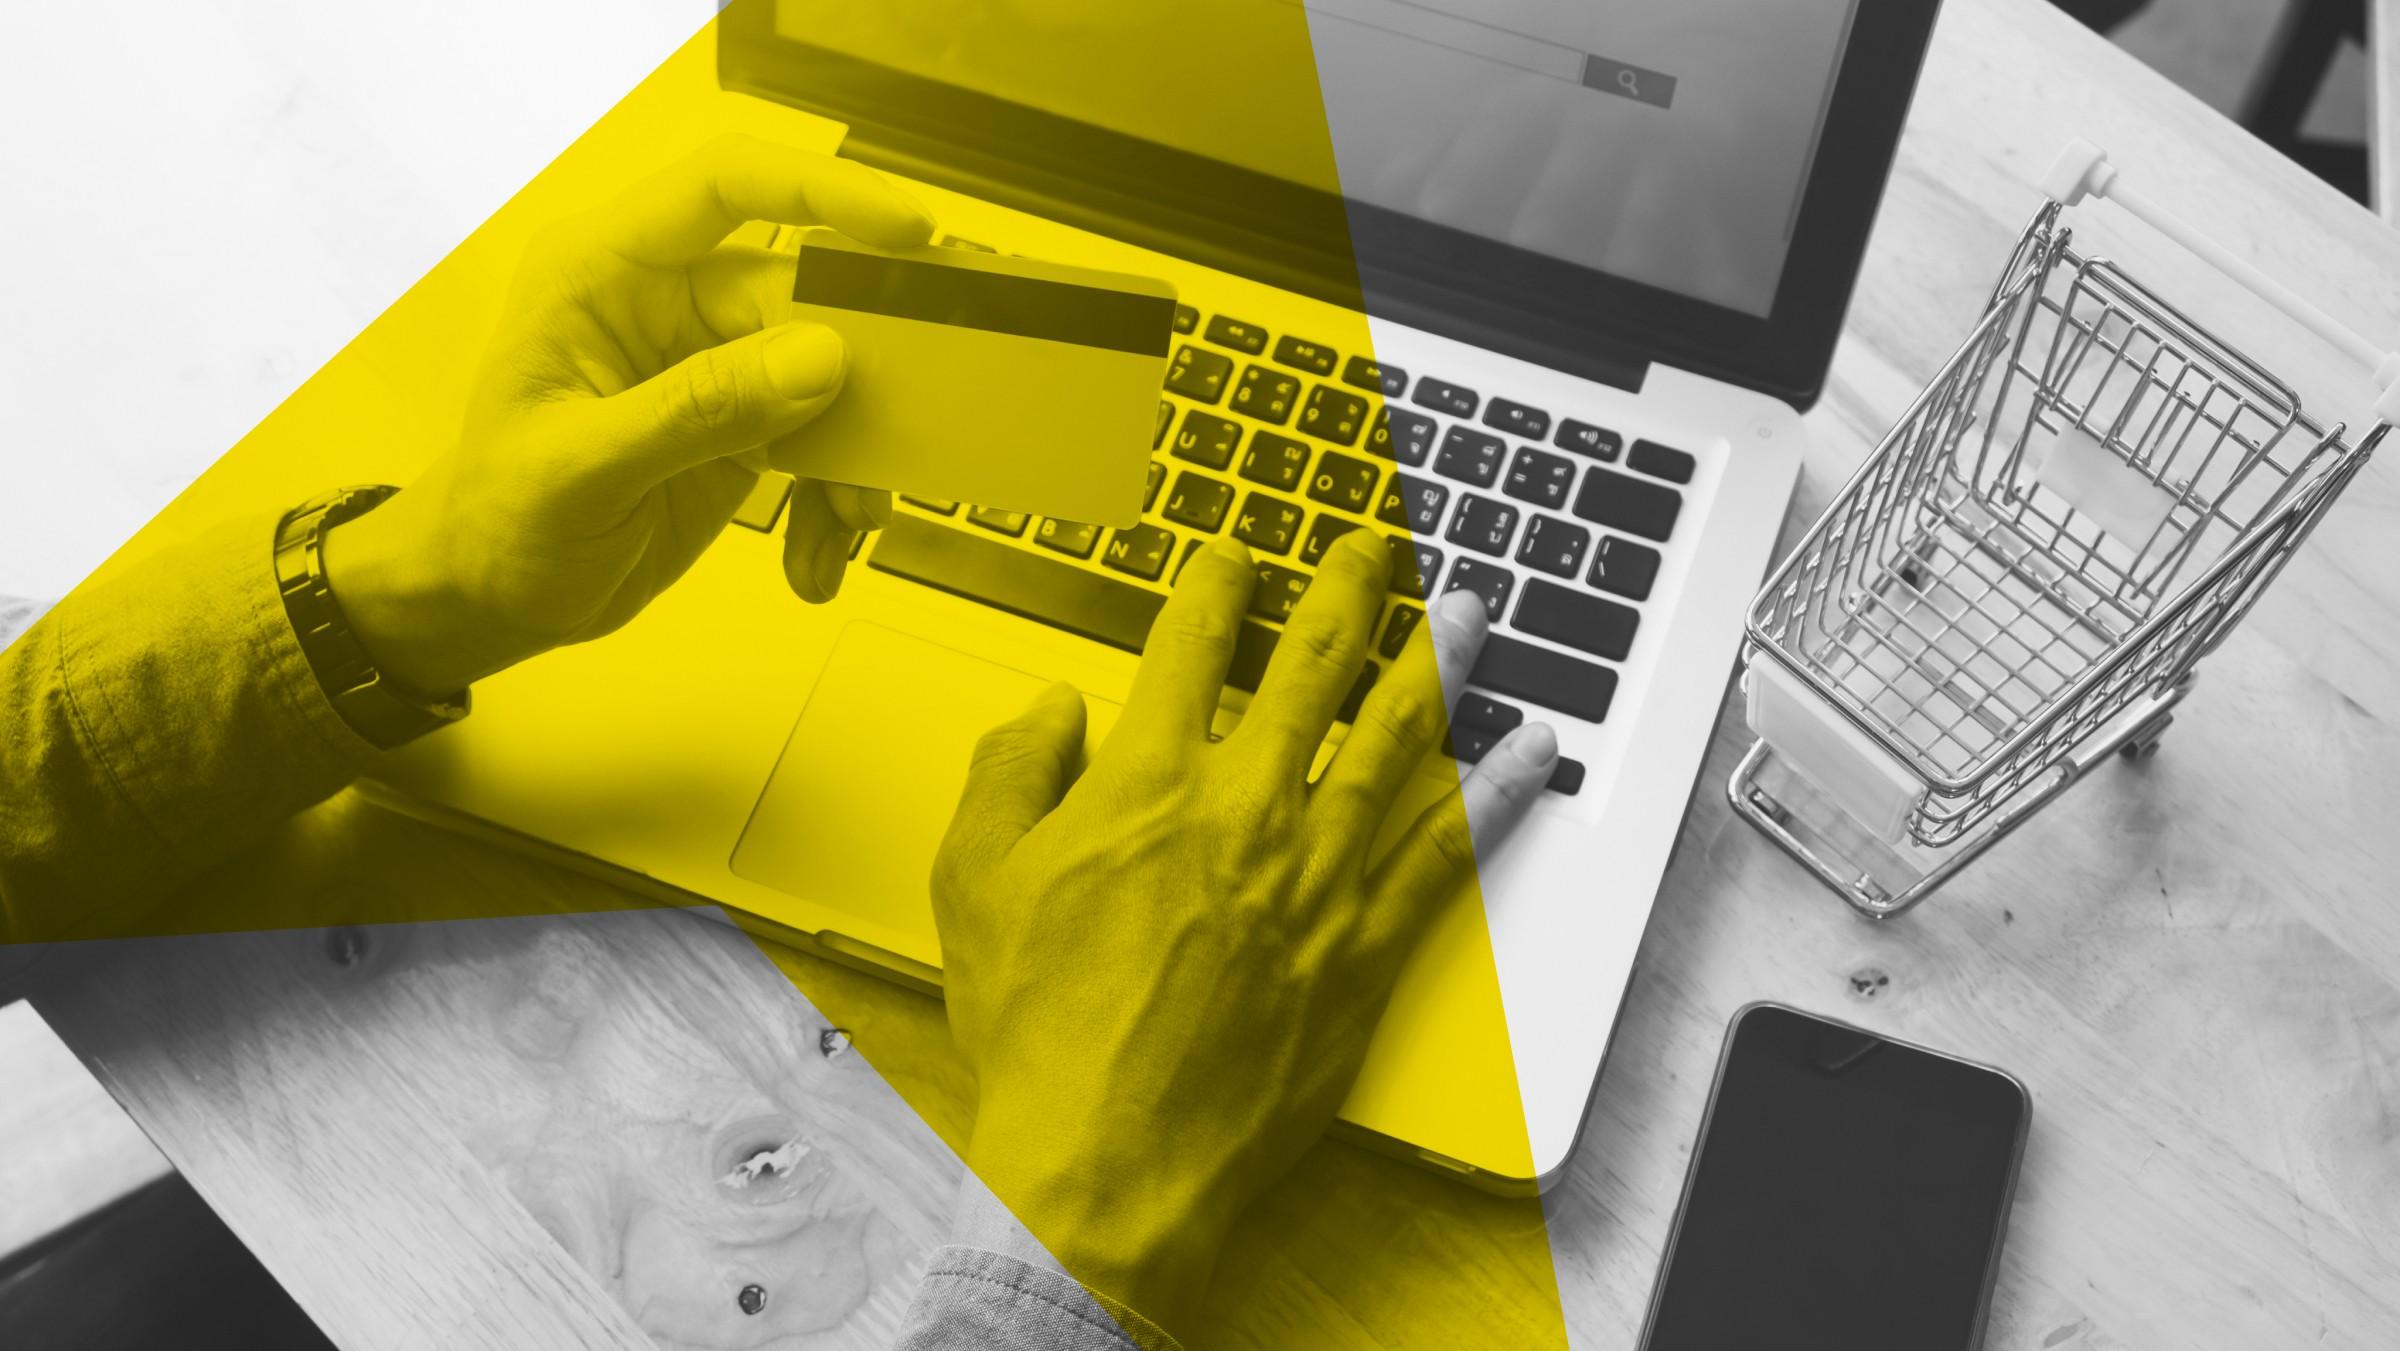 Digital Embedding Makes Insurance Relevant